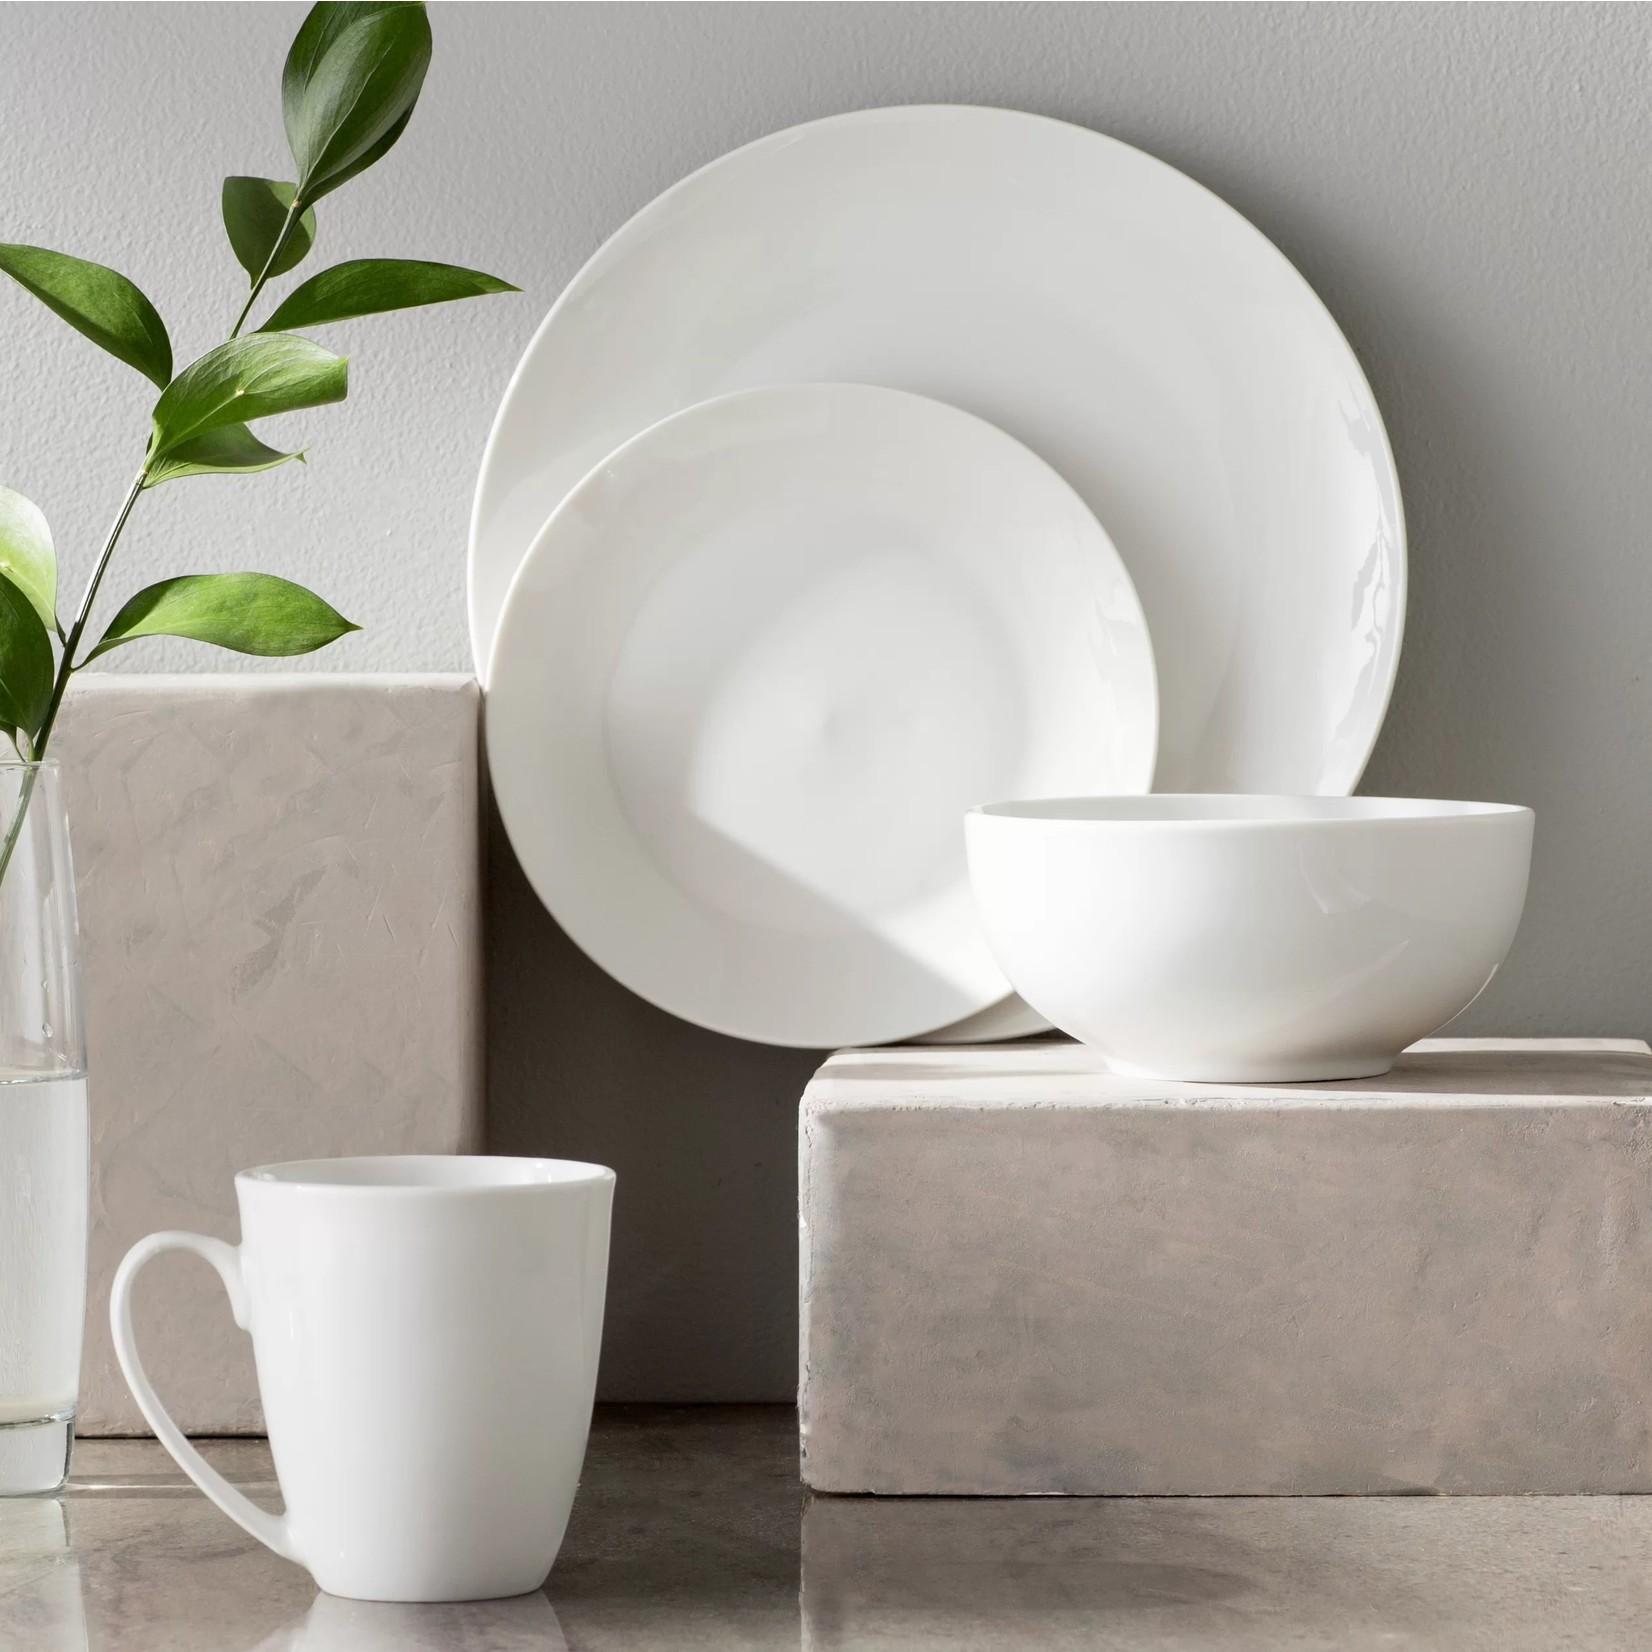 *Harrill 16 Piece Dinnerware Set - Service for 4 - White